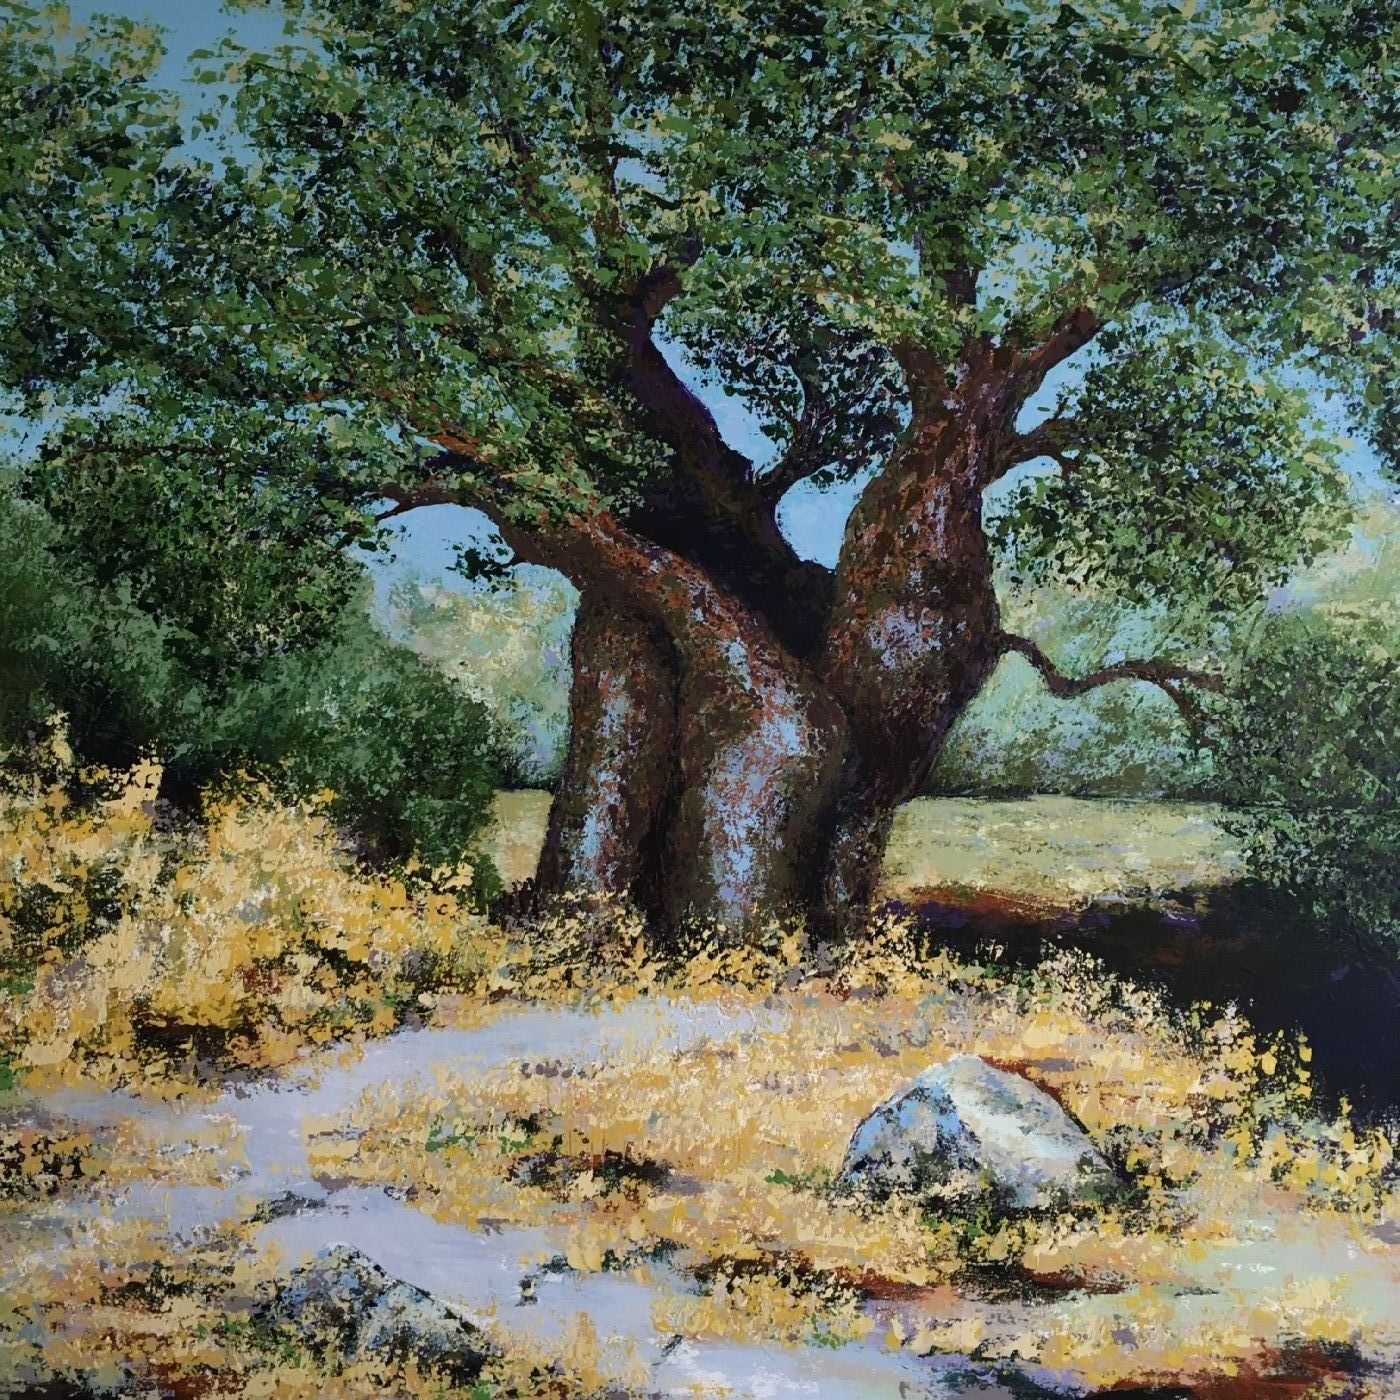 OlivenlundenafPuk Josefine Risom